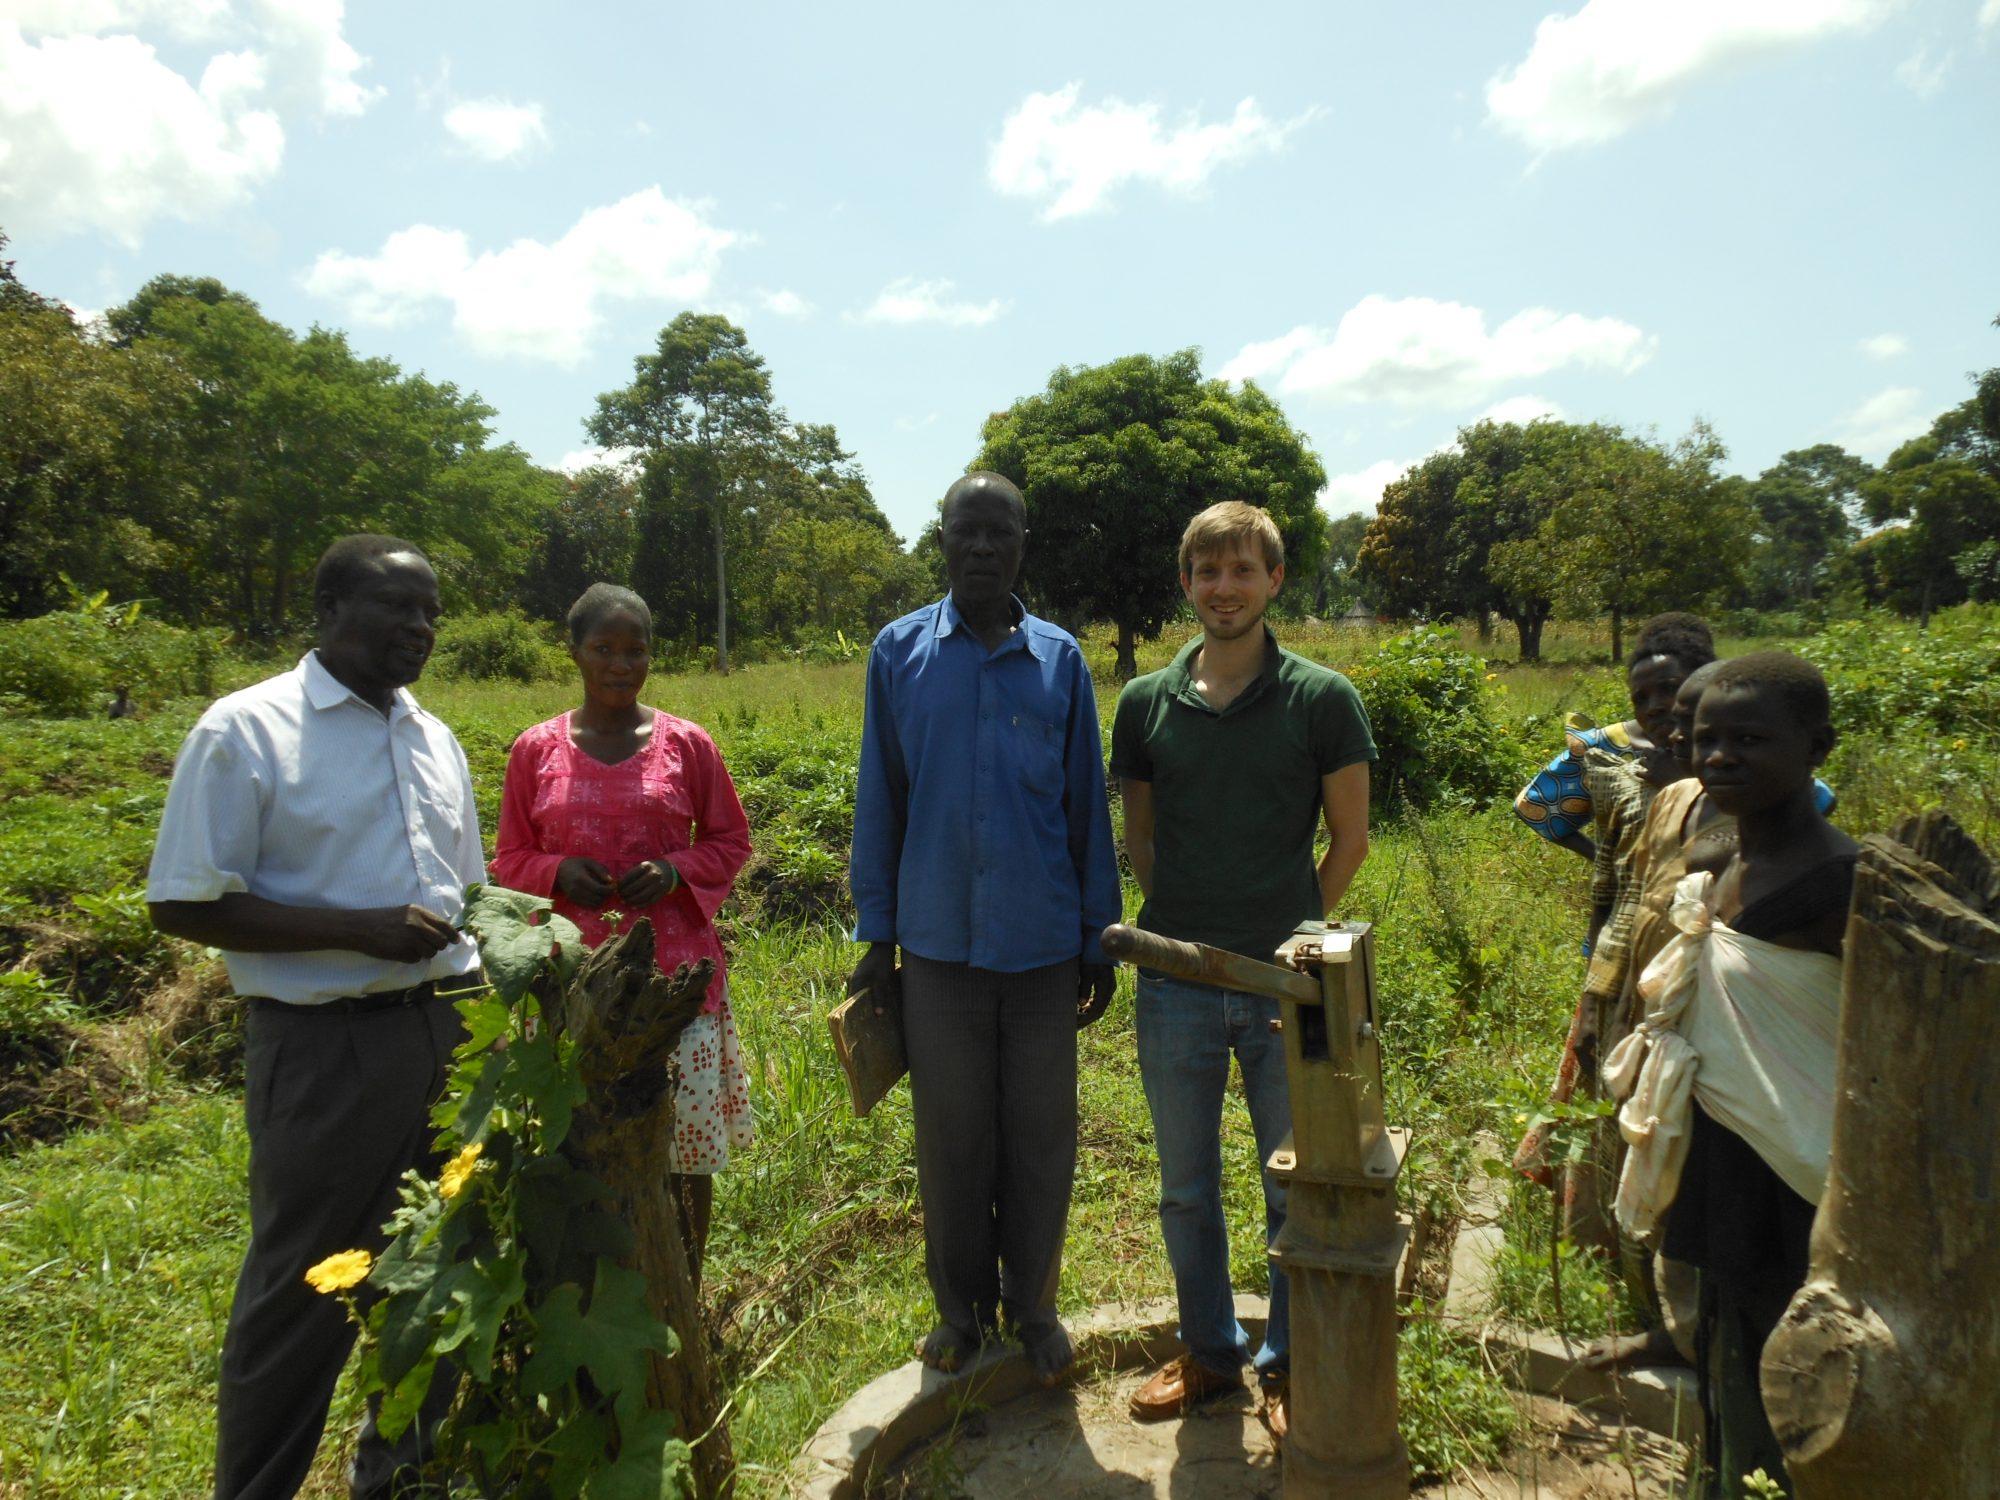 CO2balance and WAACHA visiting boreholes in need of repair